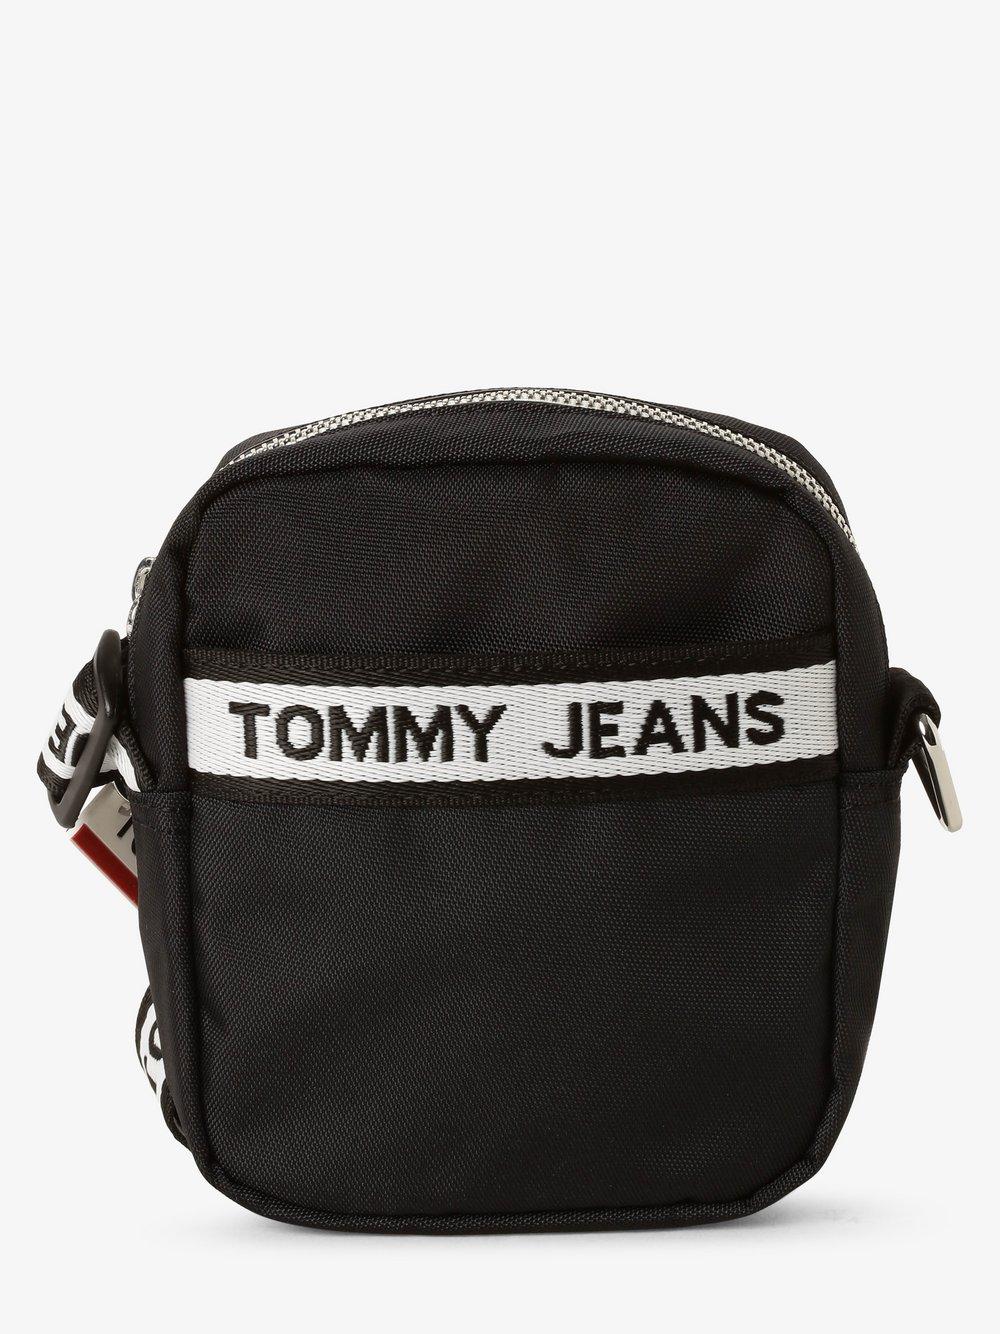 Tommy Jeans - Męska torebka na ramię, czarny